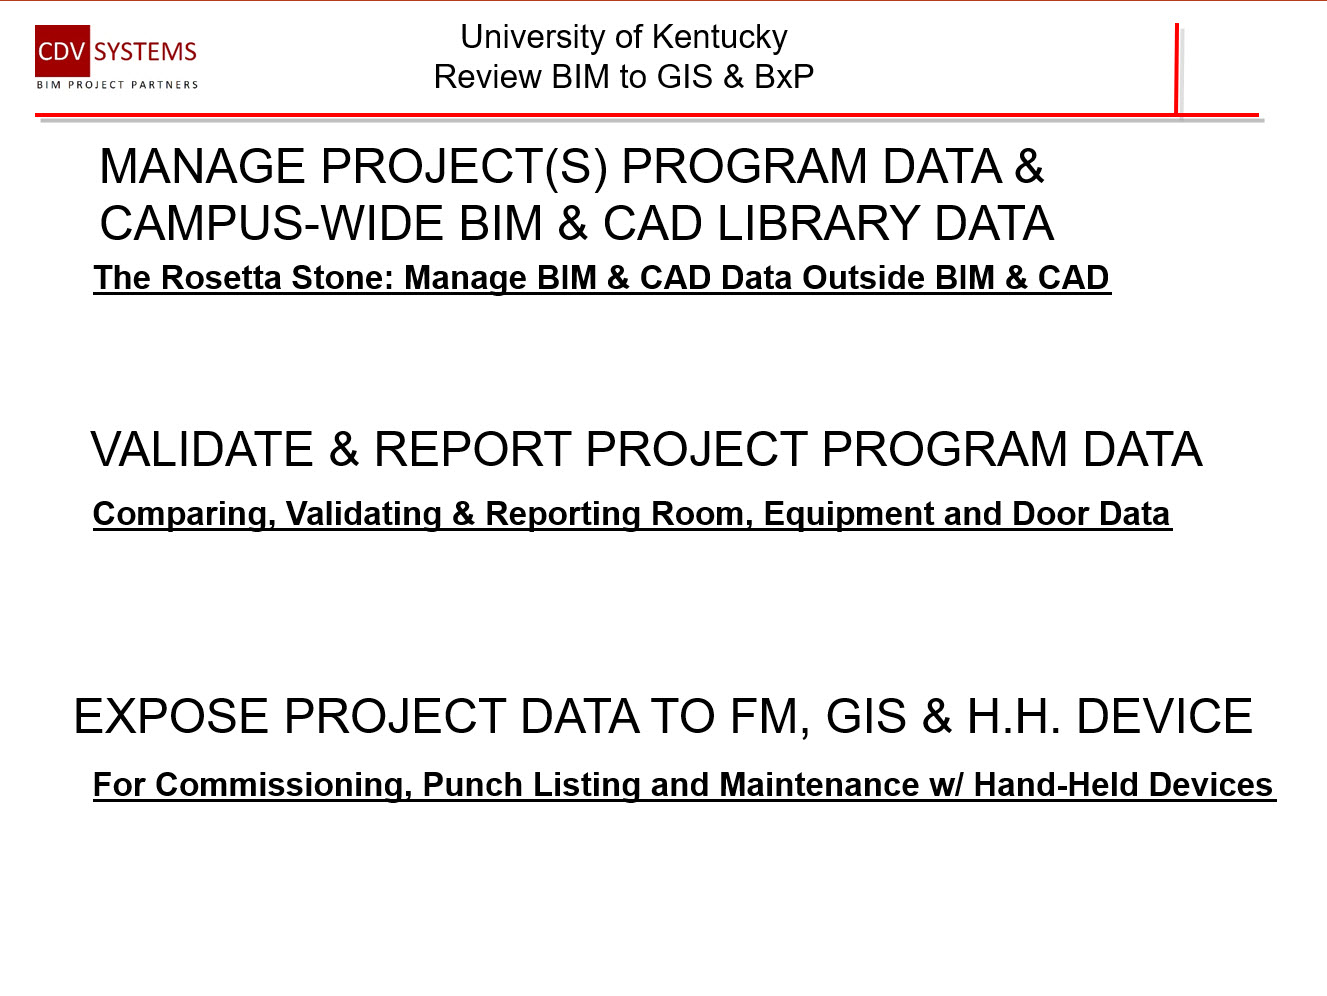 University of Kentucky_001z.jpg